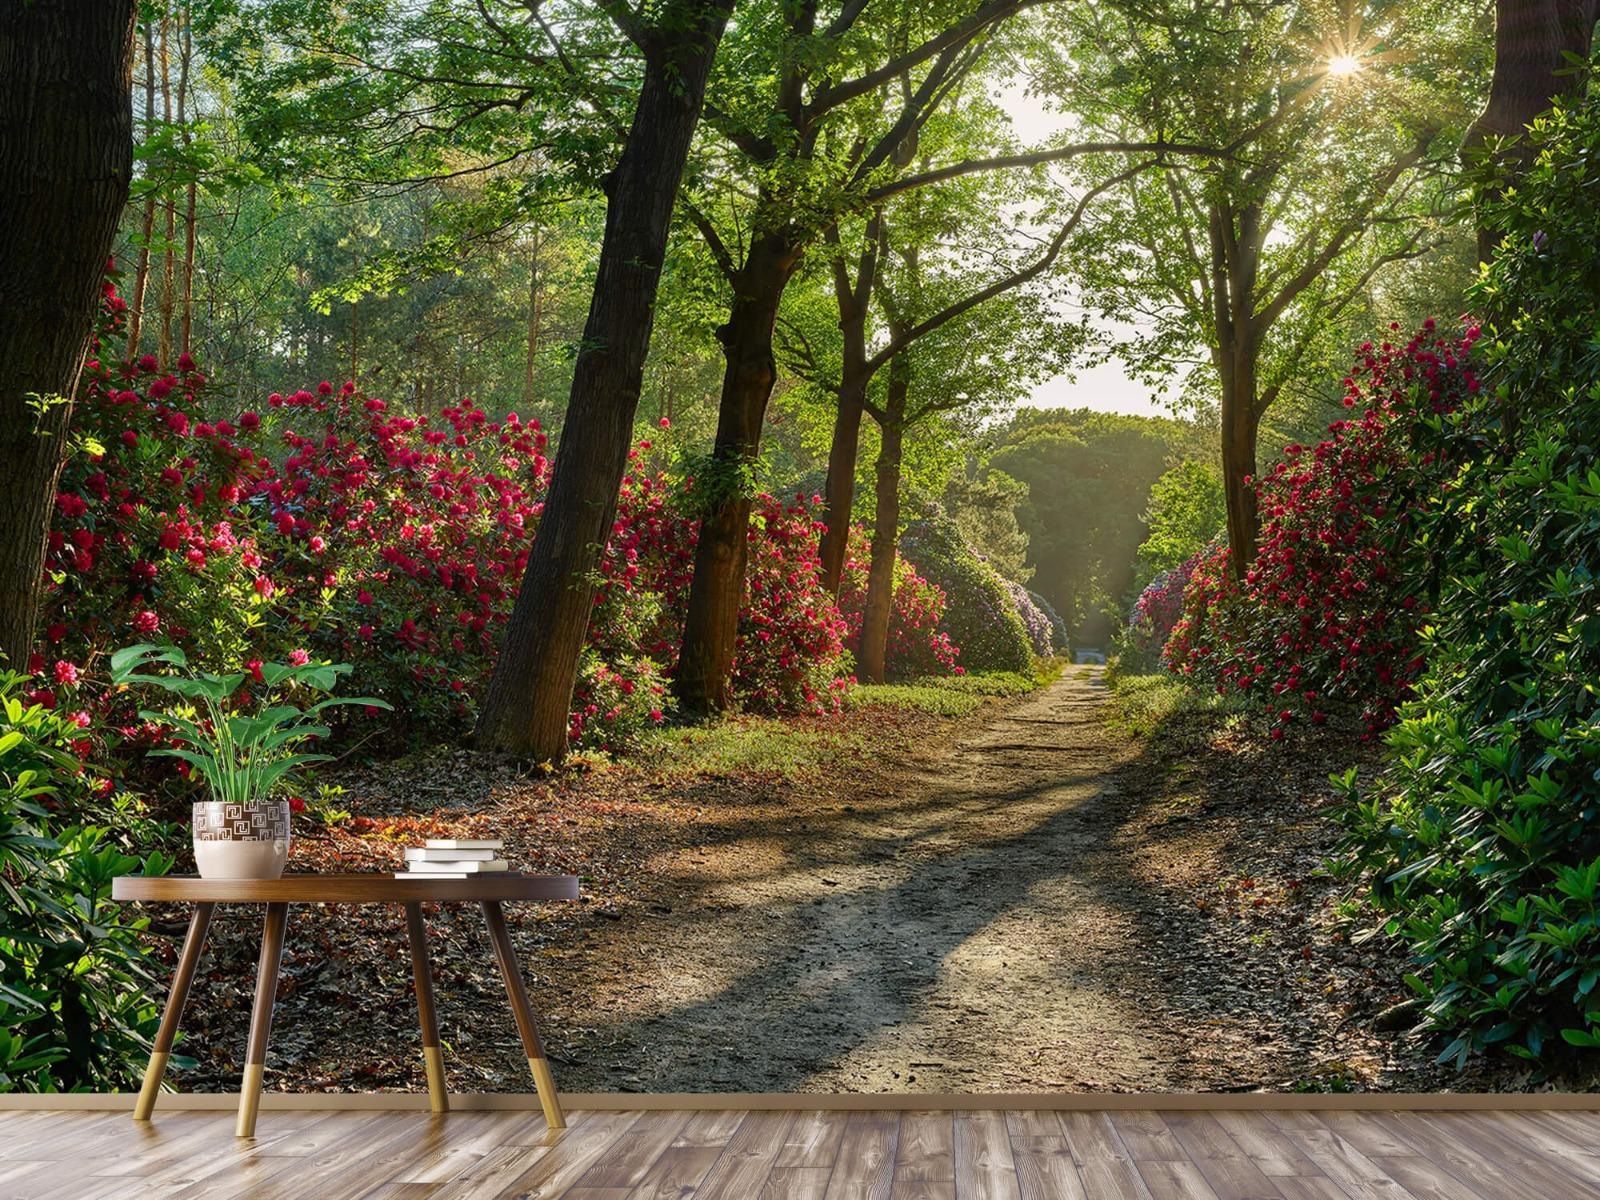 Bos - Zonsopkomst bij pad met rhododendrons 6